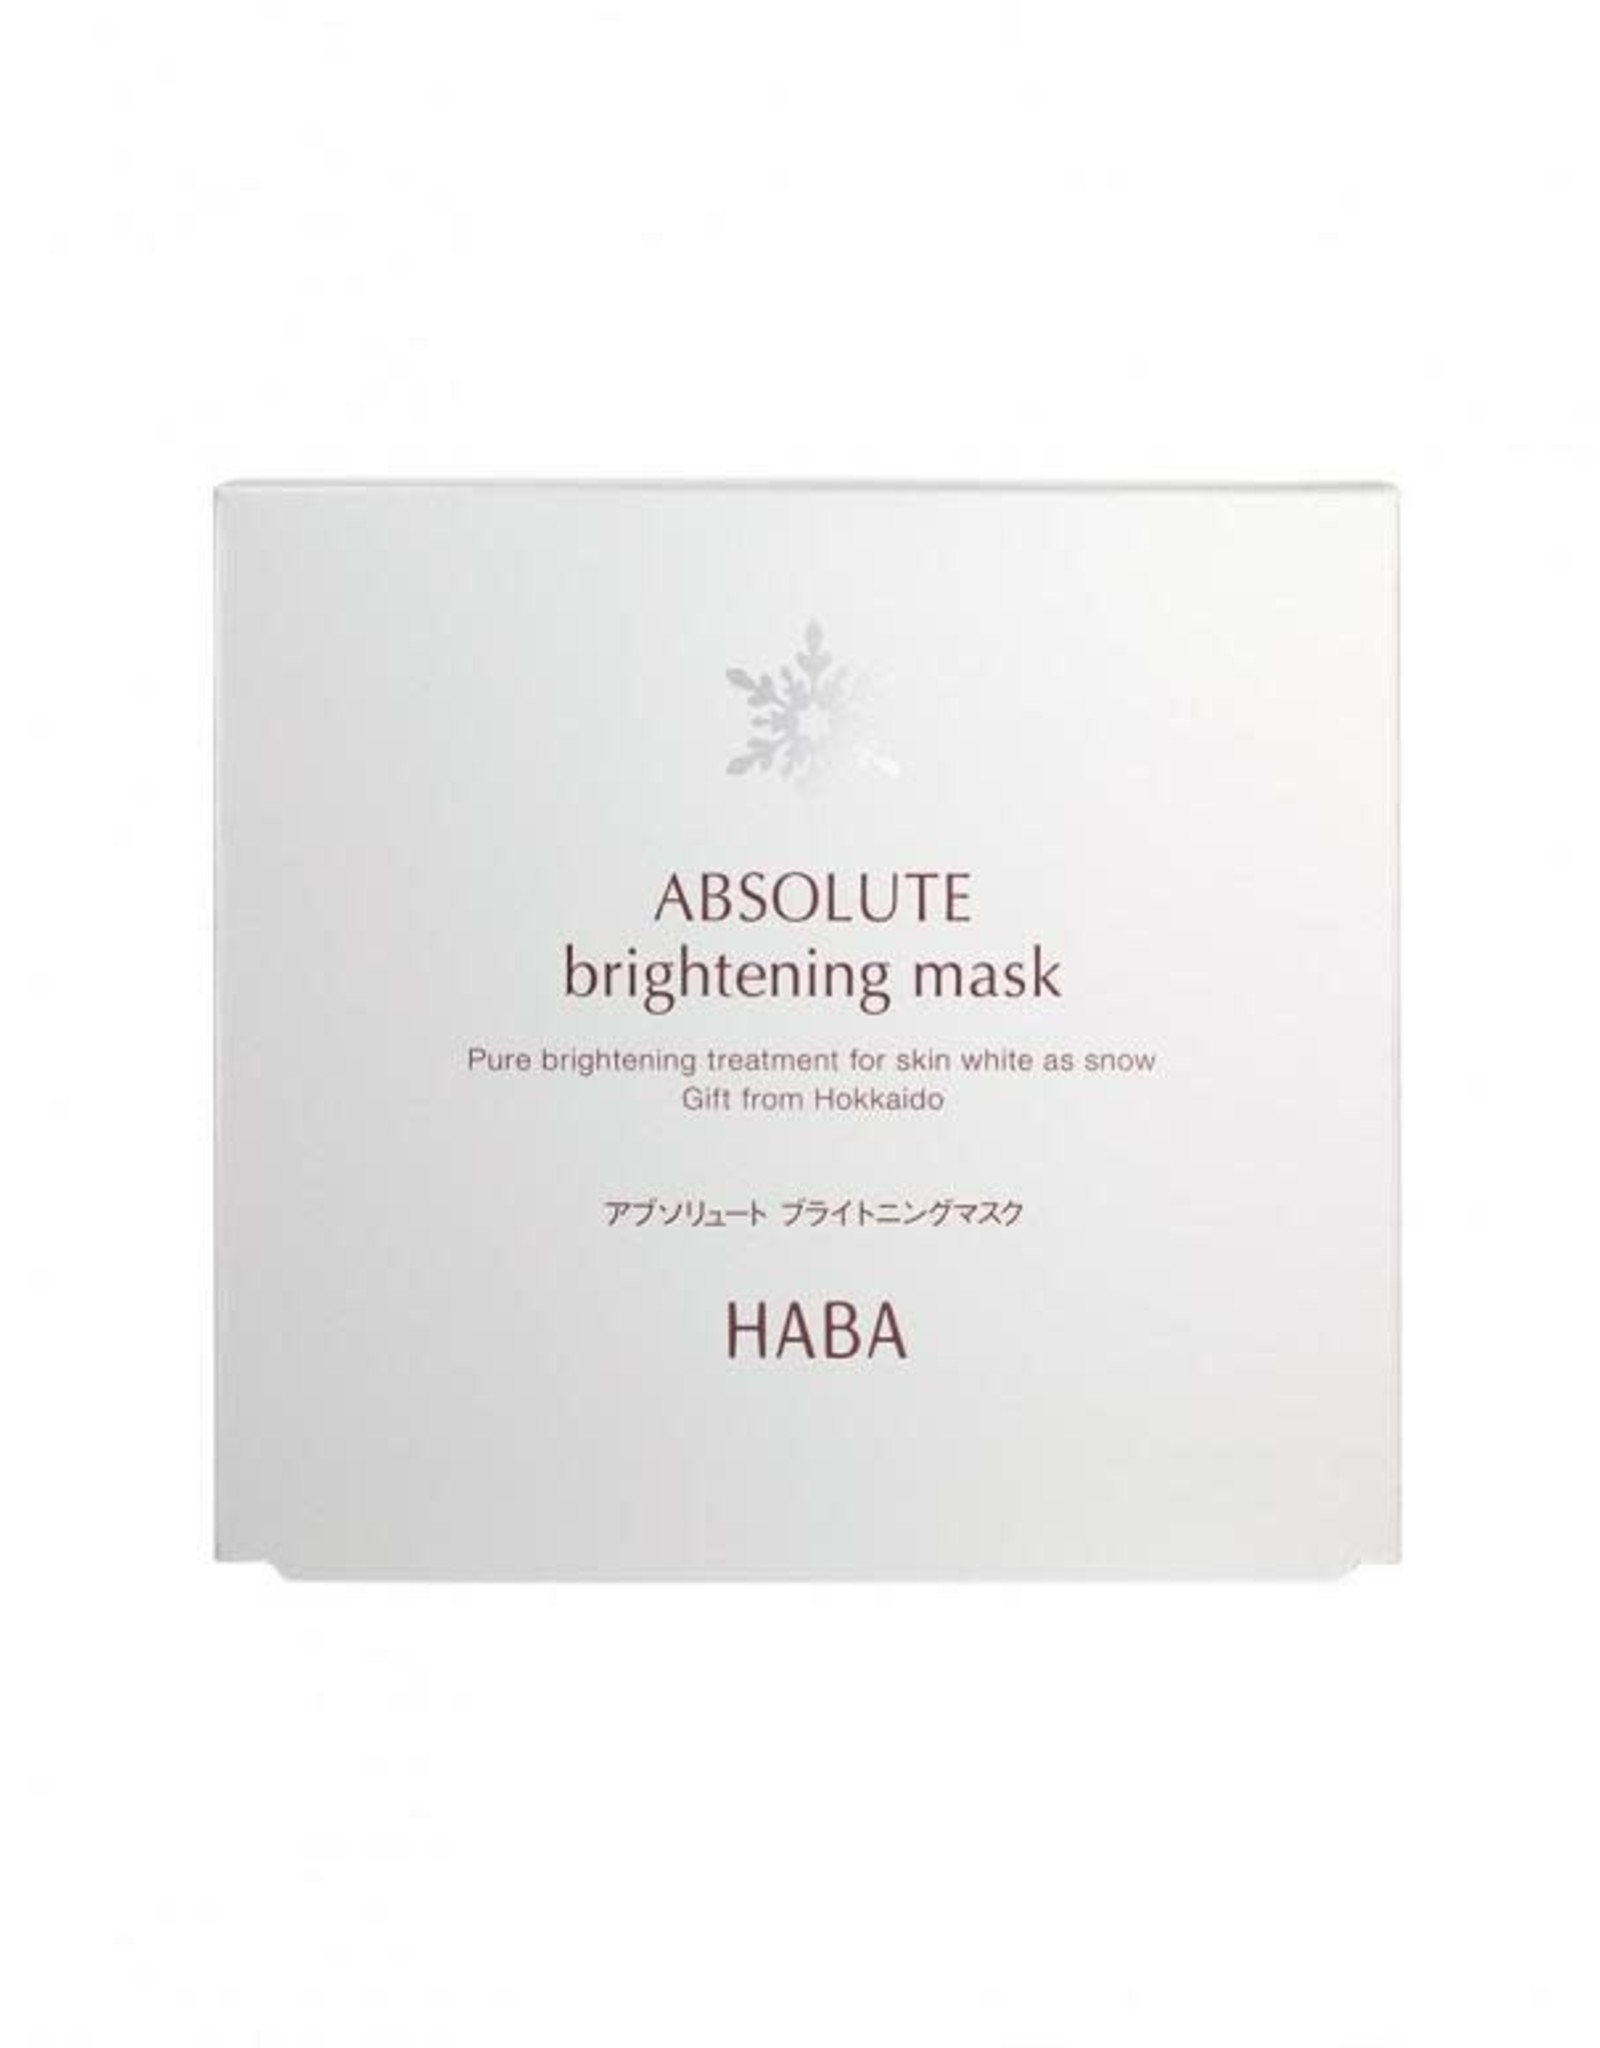 HABA Haba Absolute Brightening Mask Box